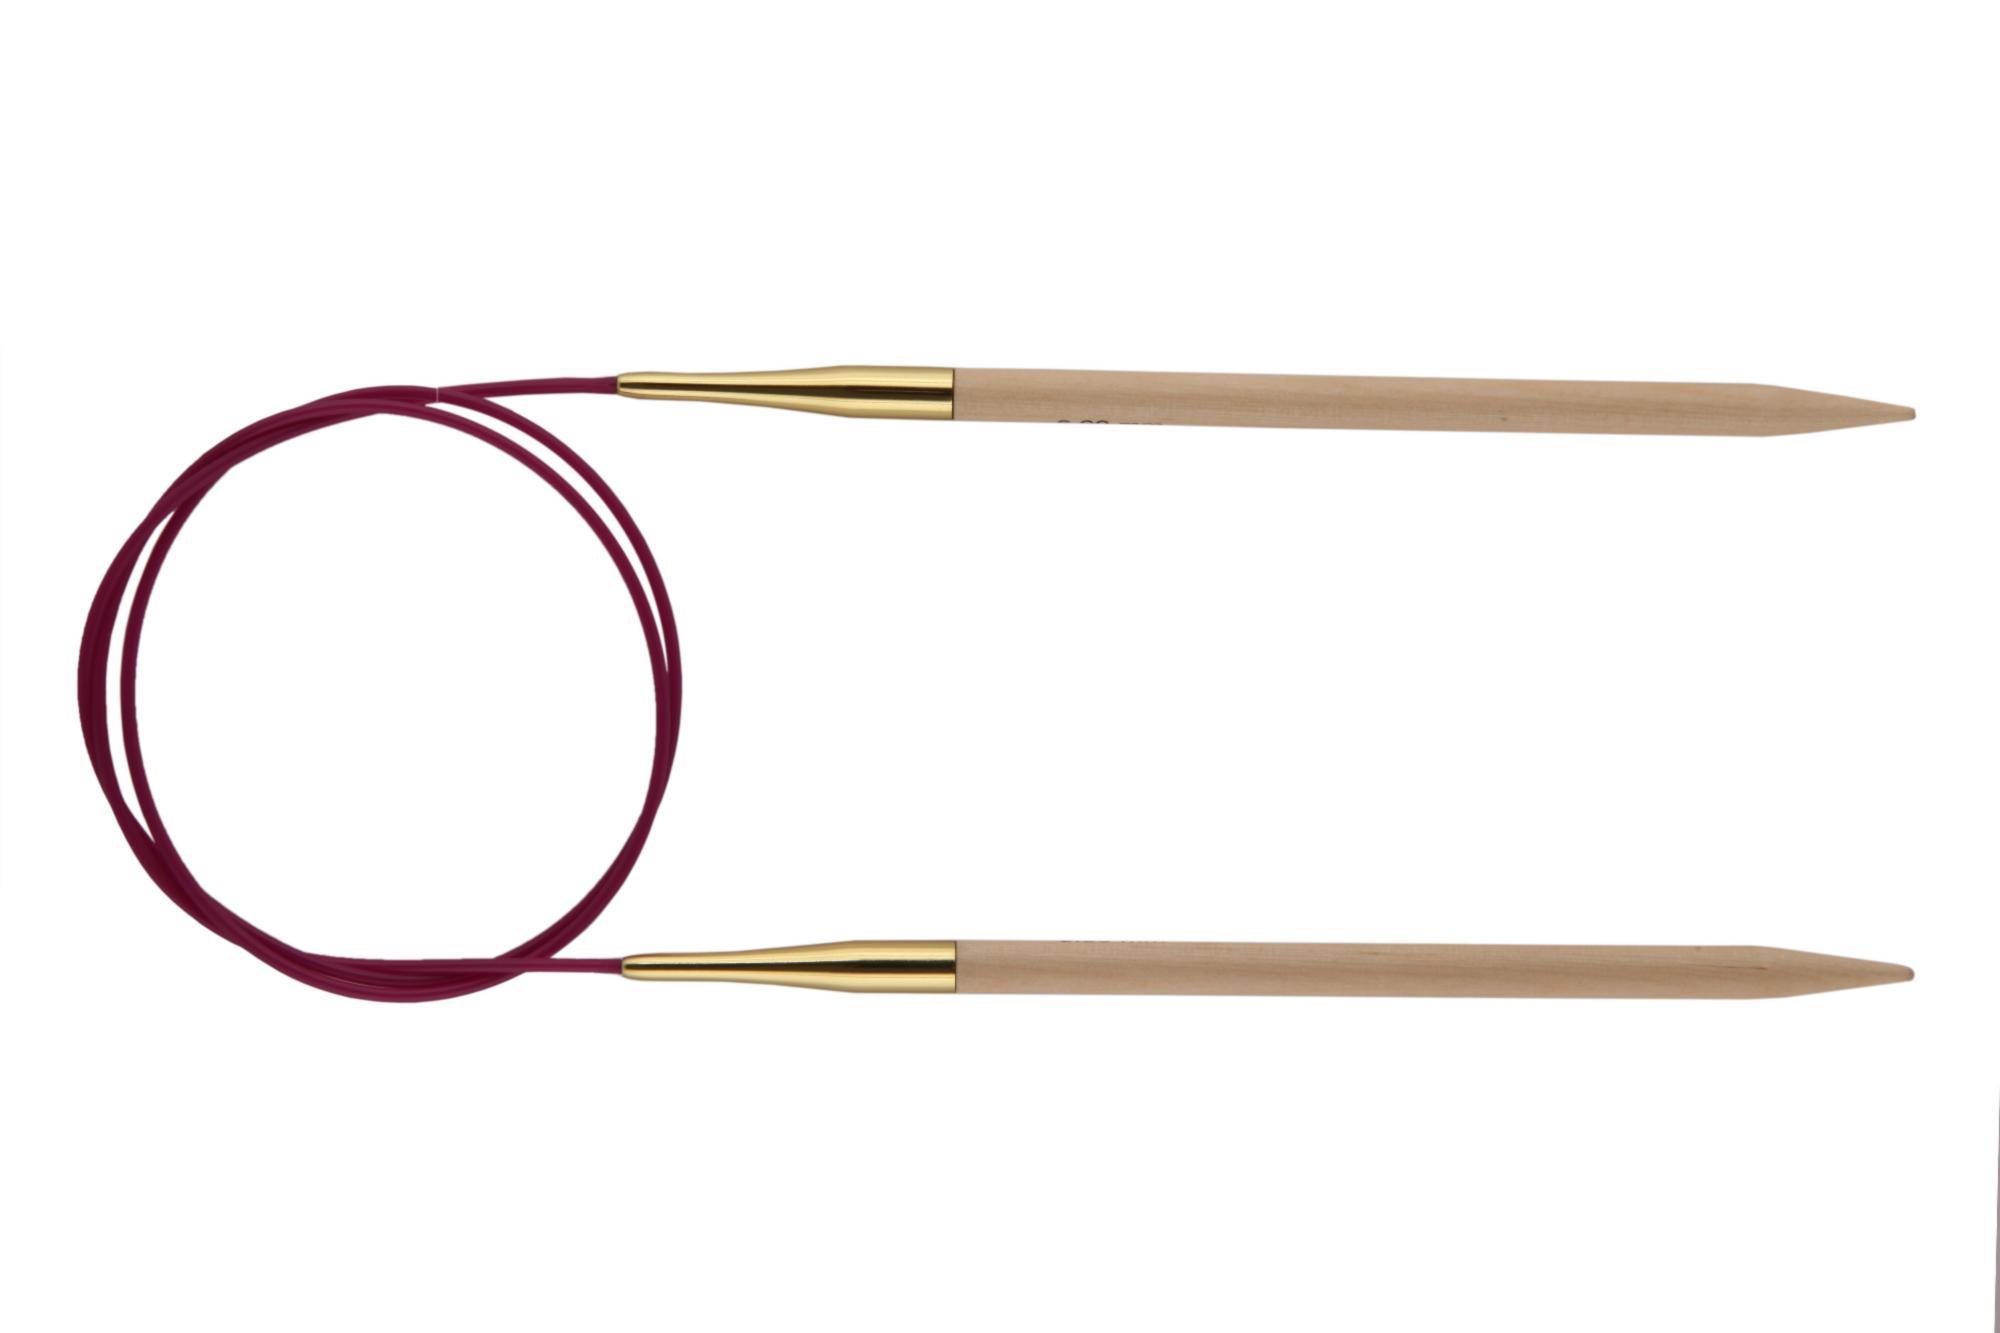 Спицы круговые 150 см Basix Birch Wood KnitPro, 35361, 5.50 мм